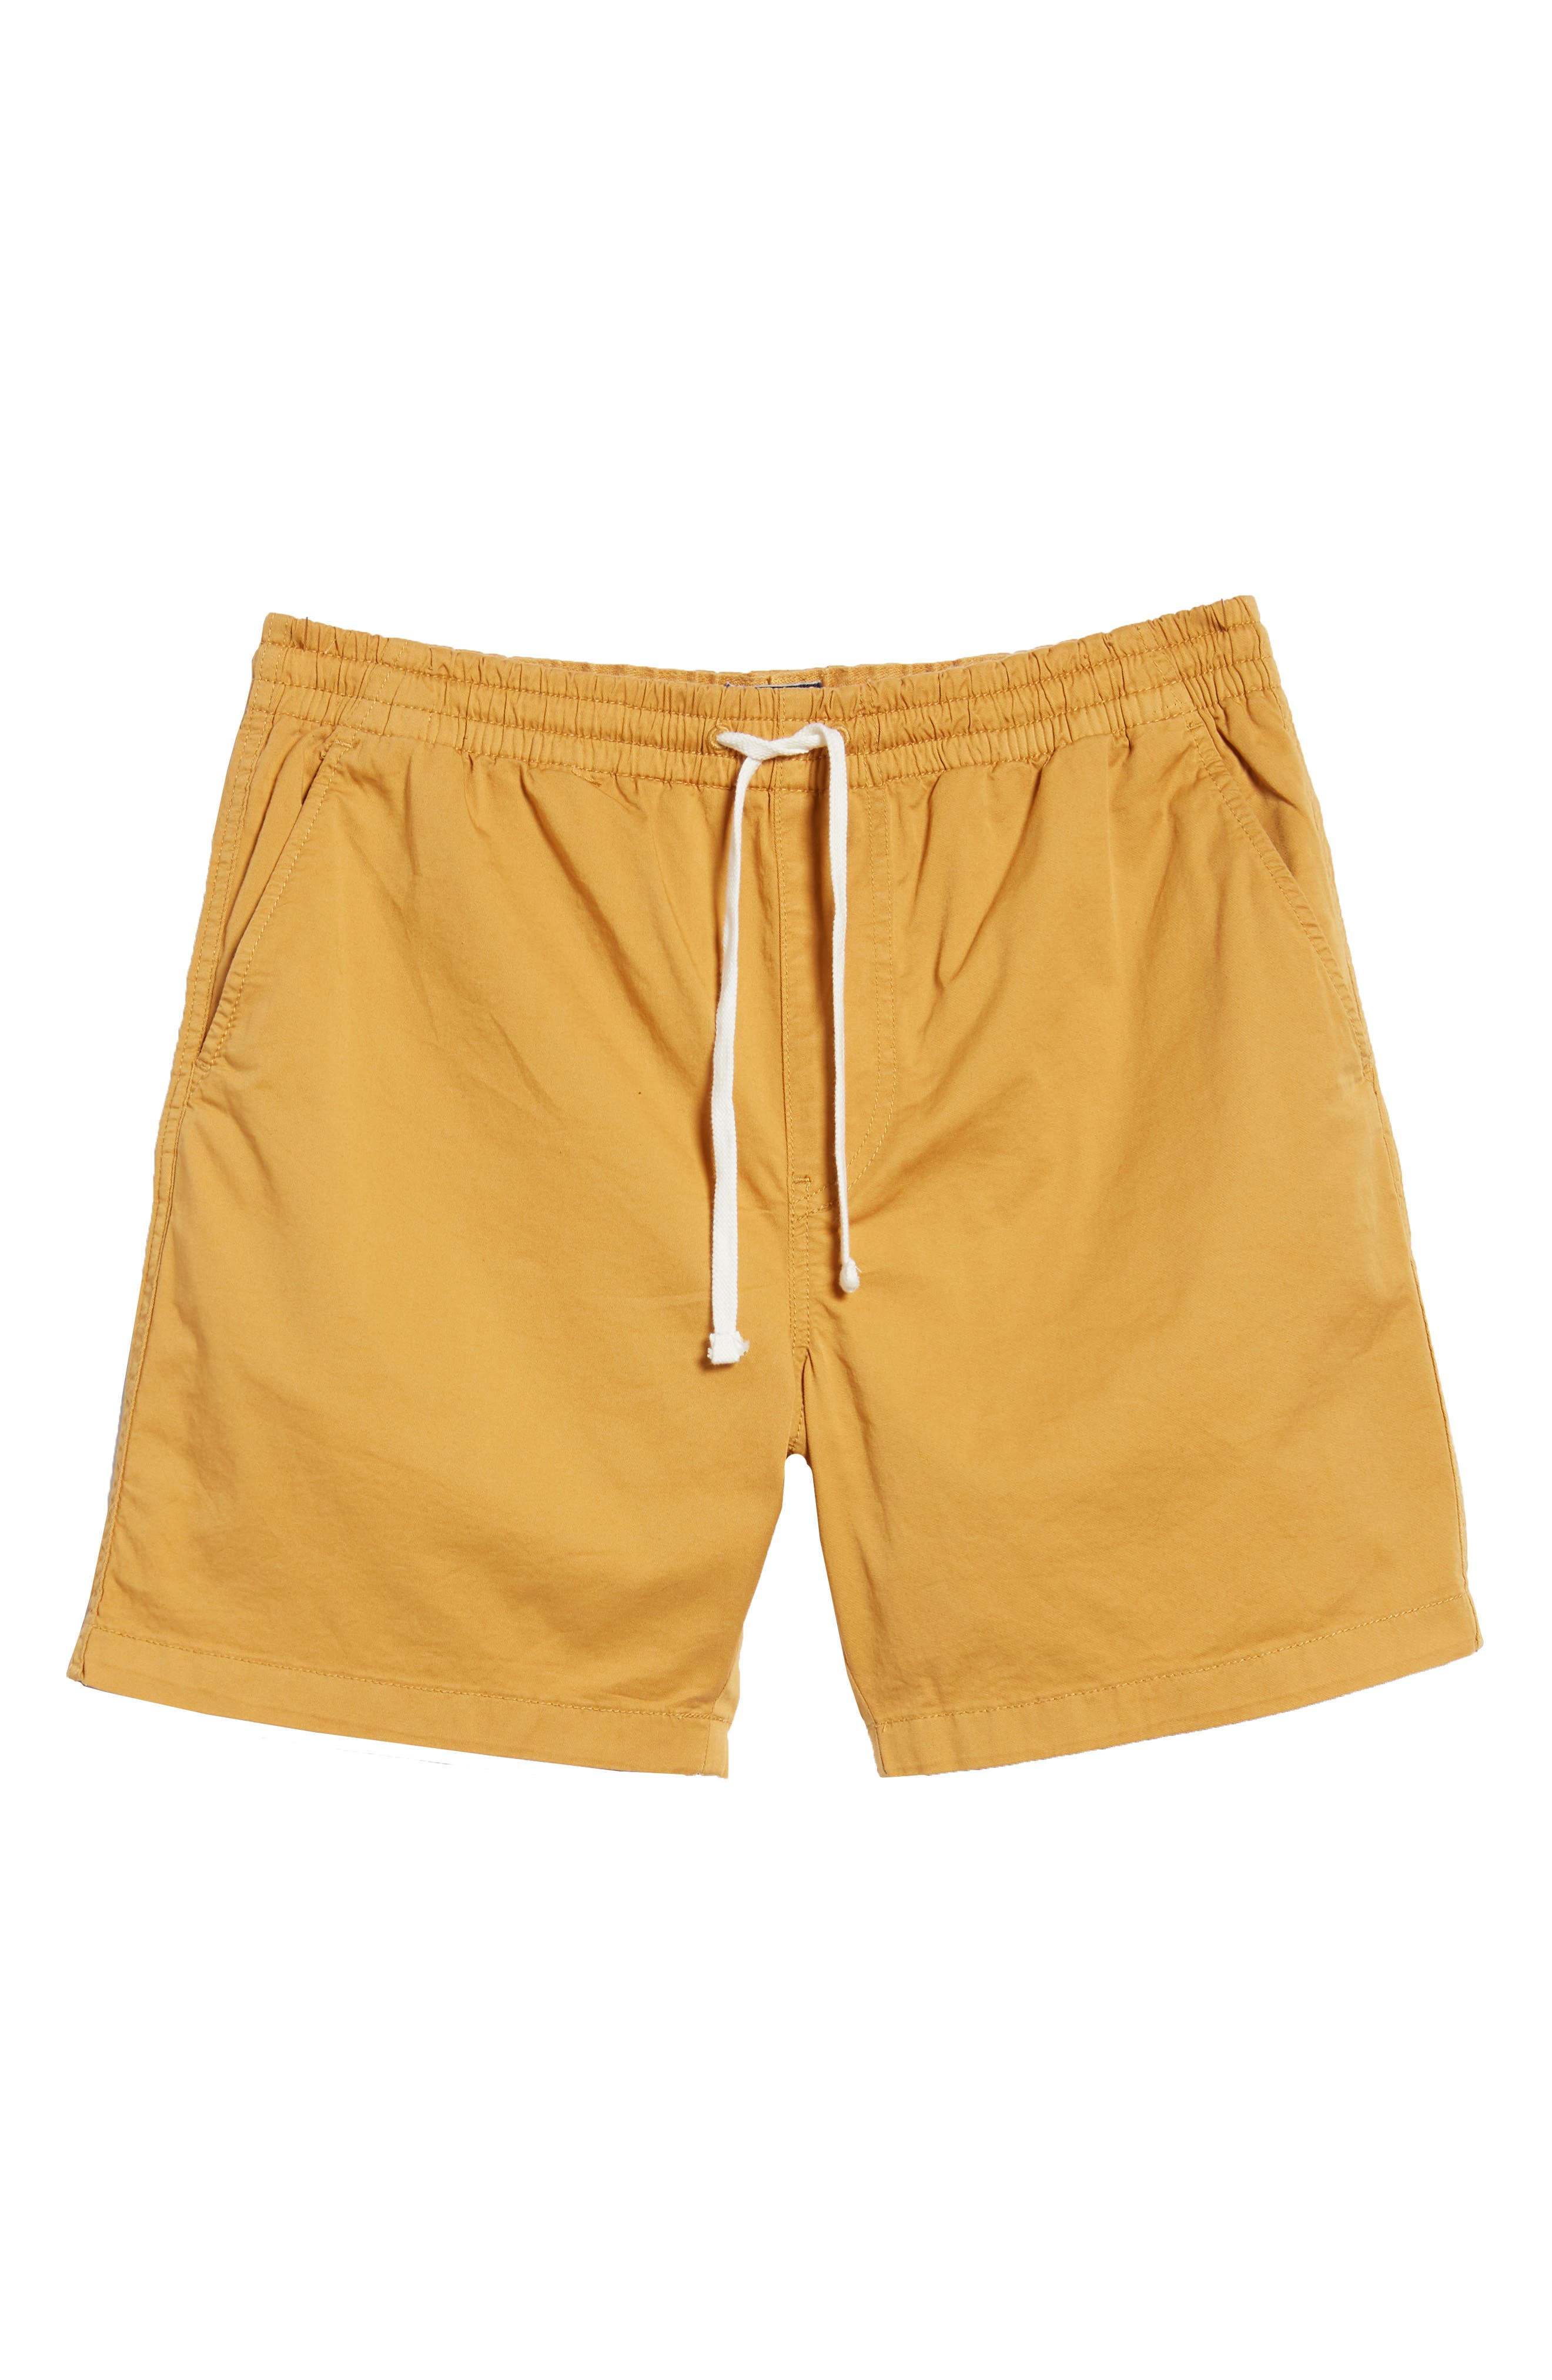 J.Crew Stretch Chino Dock Shorts